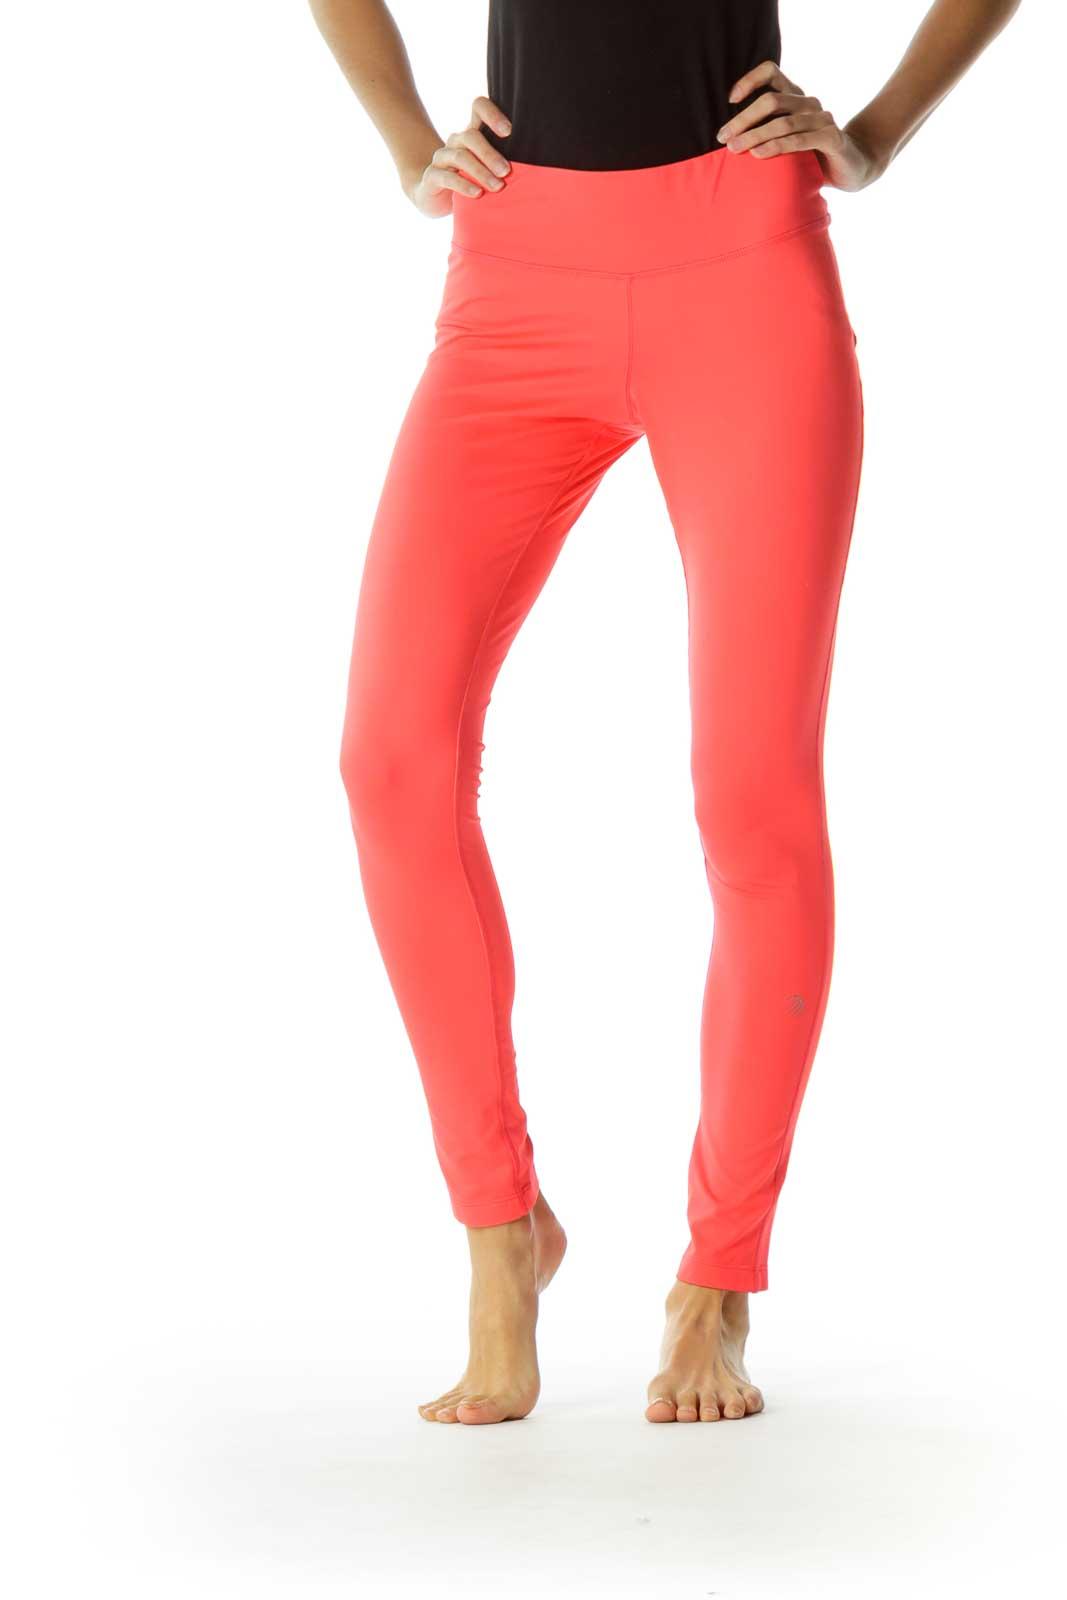 Pink Yoga Pants Front